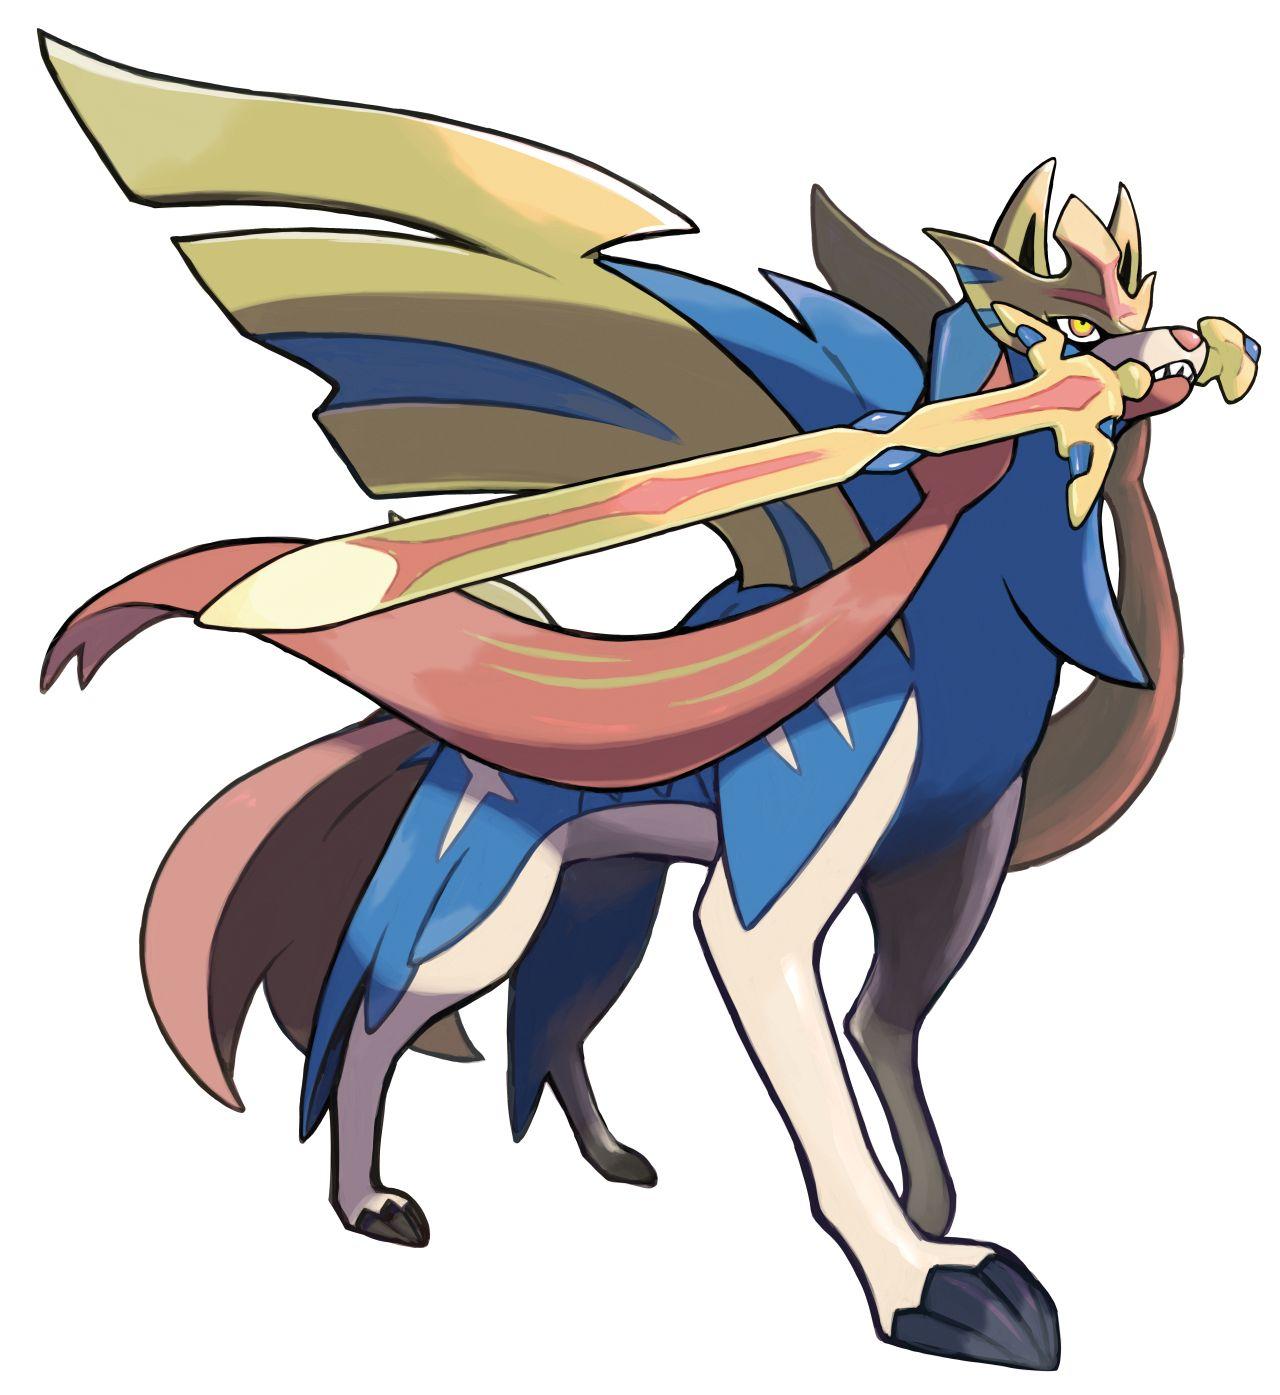 Pokemon Sword And Shield Legendaries Zacian And Zamazenta Are The